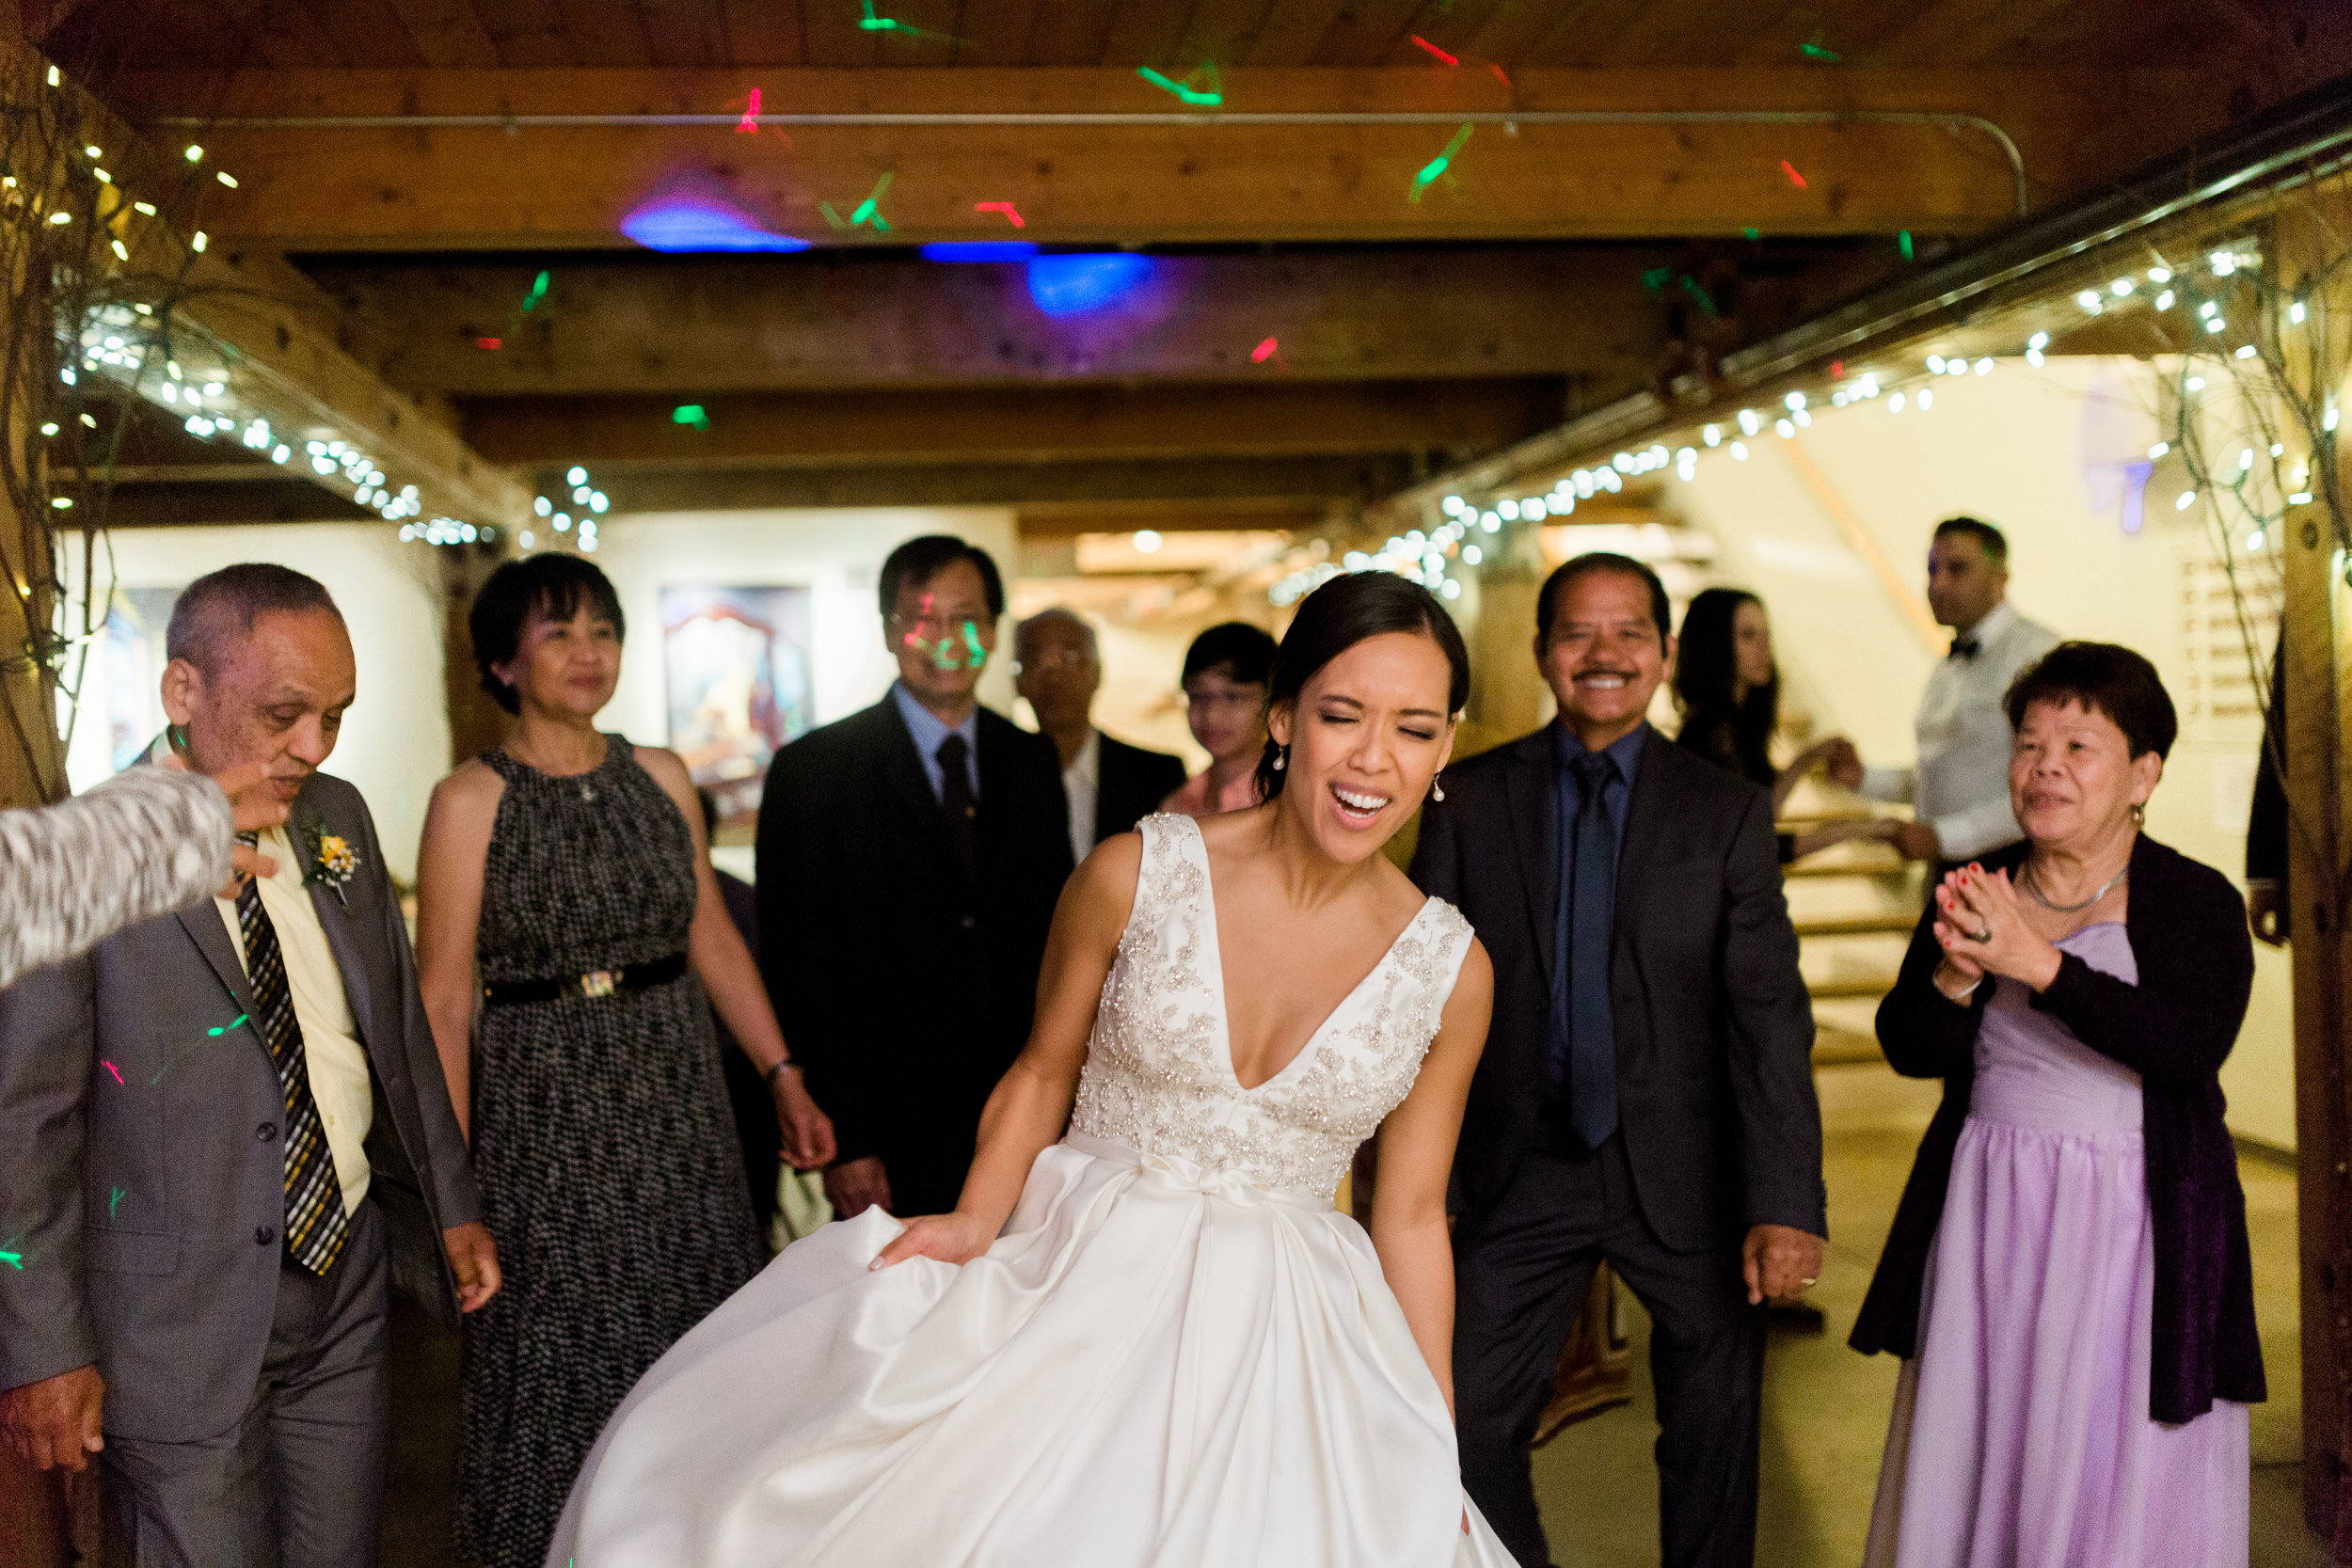 Alton Mills Wedding - Reception-188.jpg